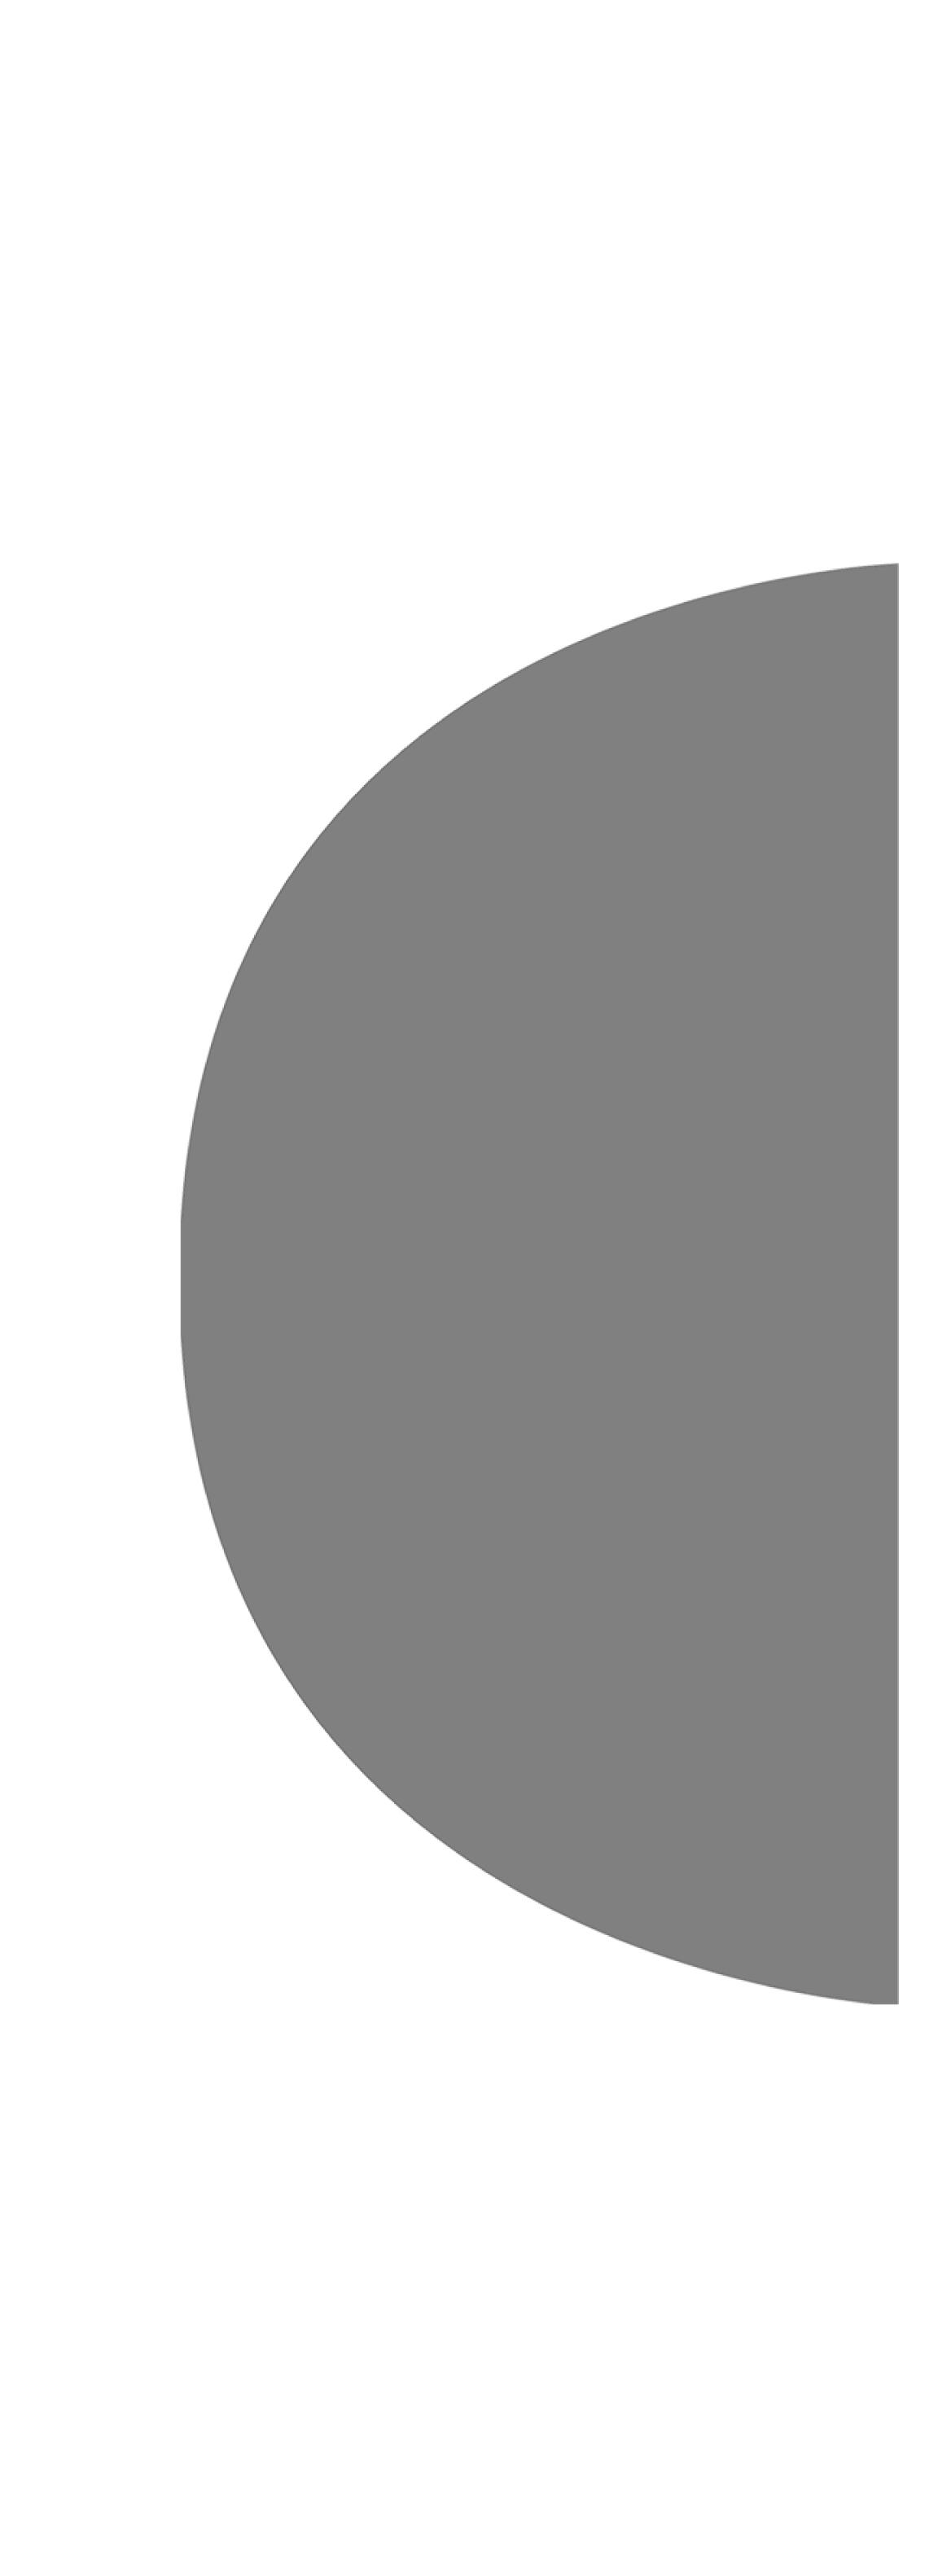 Profil 1/2 CORDE DARD